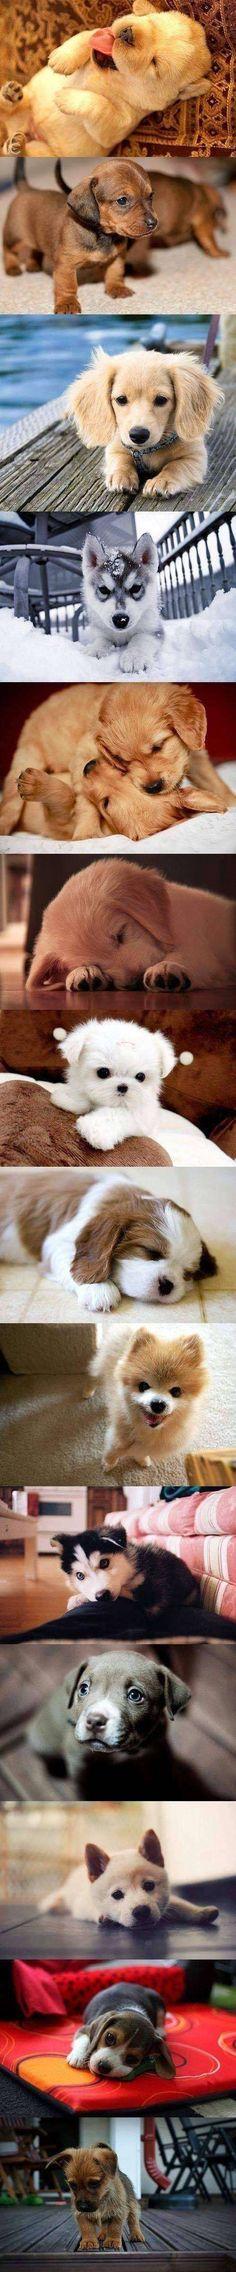 Cute Puppies*